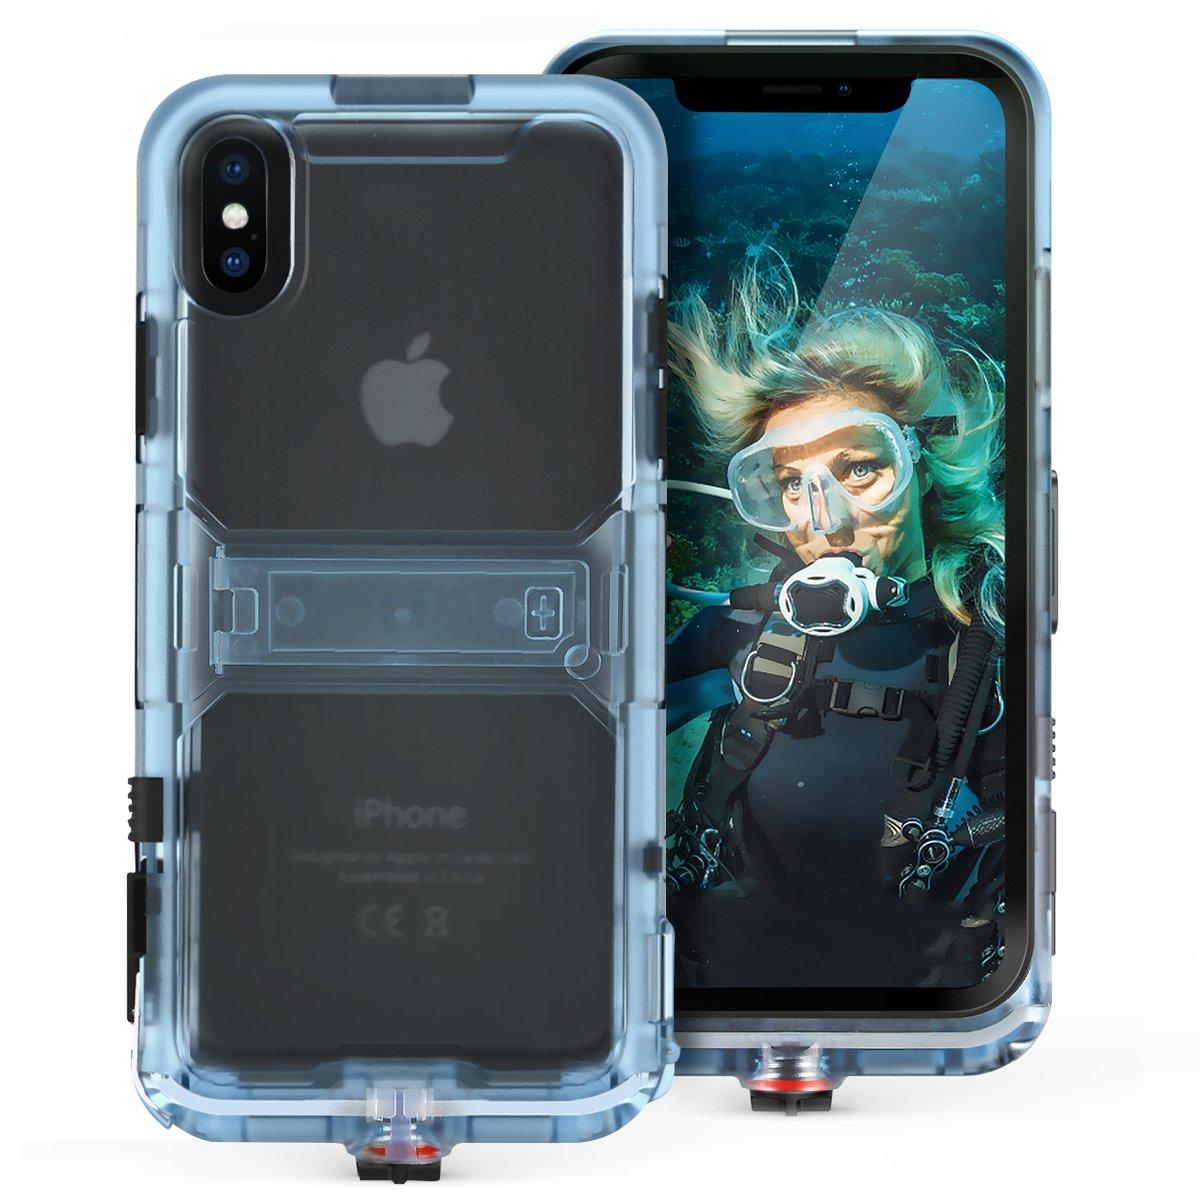 Cornmi iPhone X Waterproof Case, Full Sealed IP68 Certified Waterproof Shockproof Snowproof Protection Underwater Case for iPhone X 5.2inch (Black)